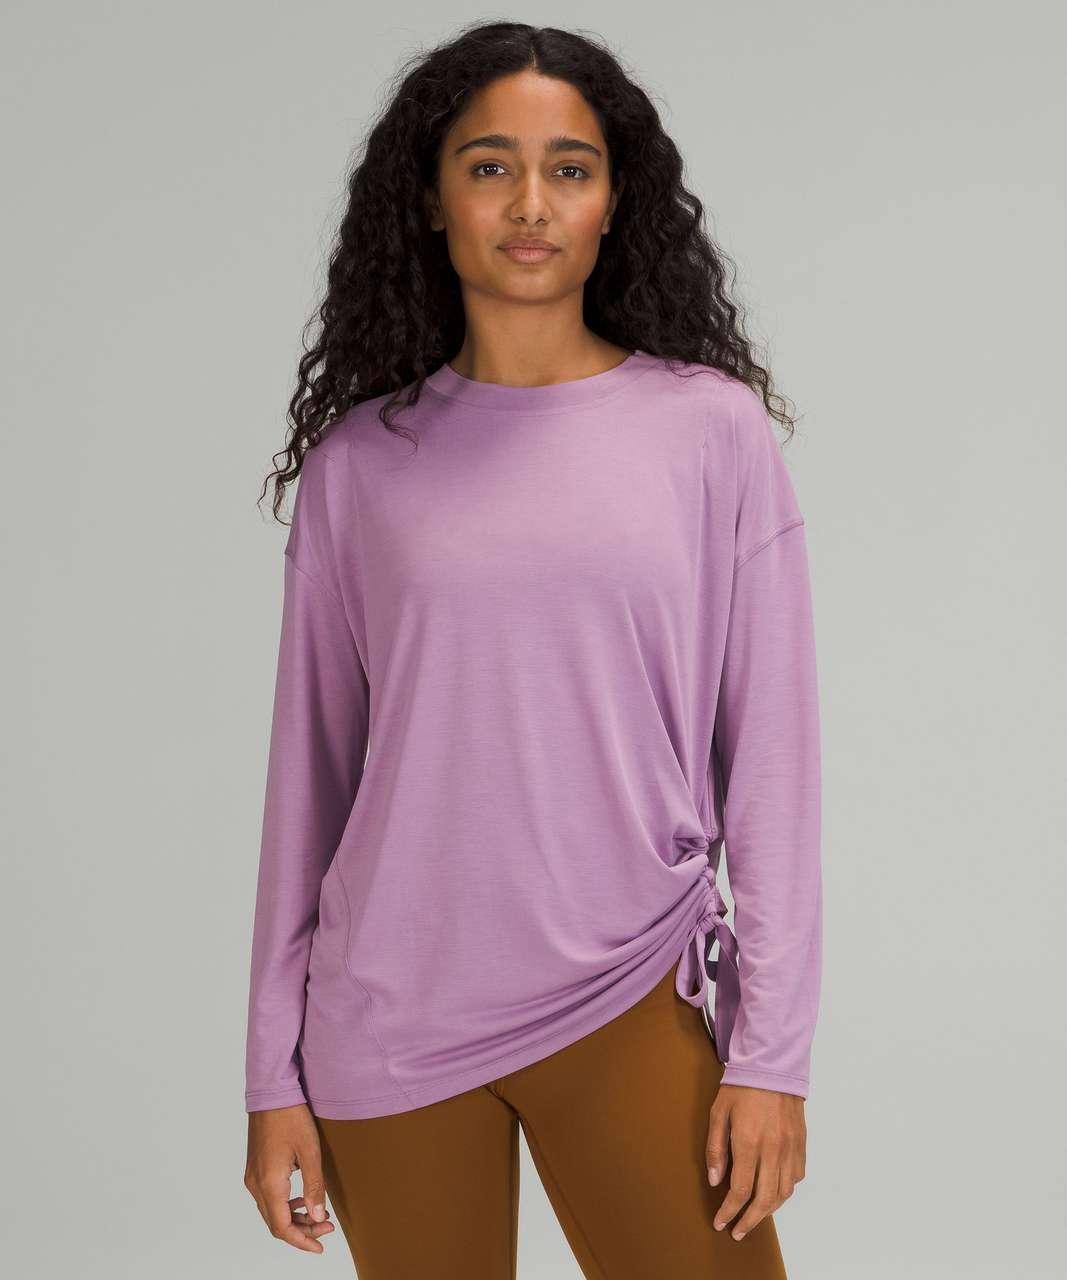 Lululemon Side Cinch Long Sleeve Crew - Wisteria Purple